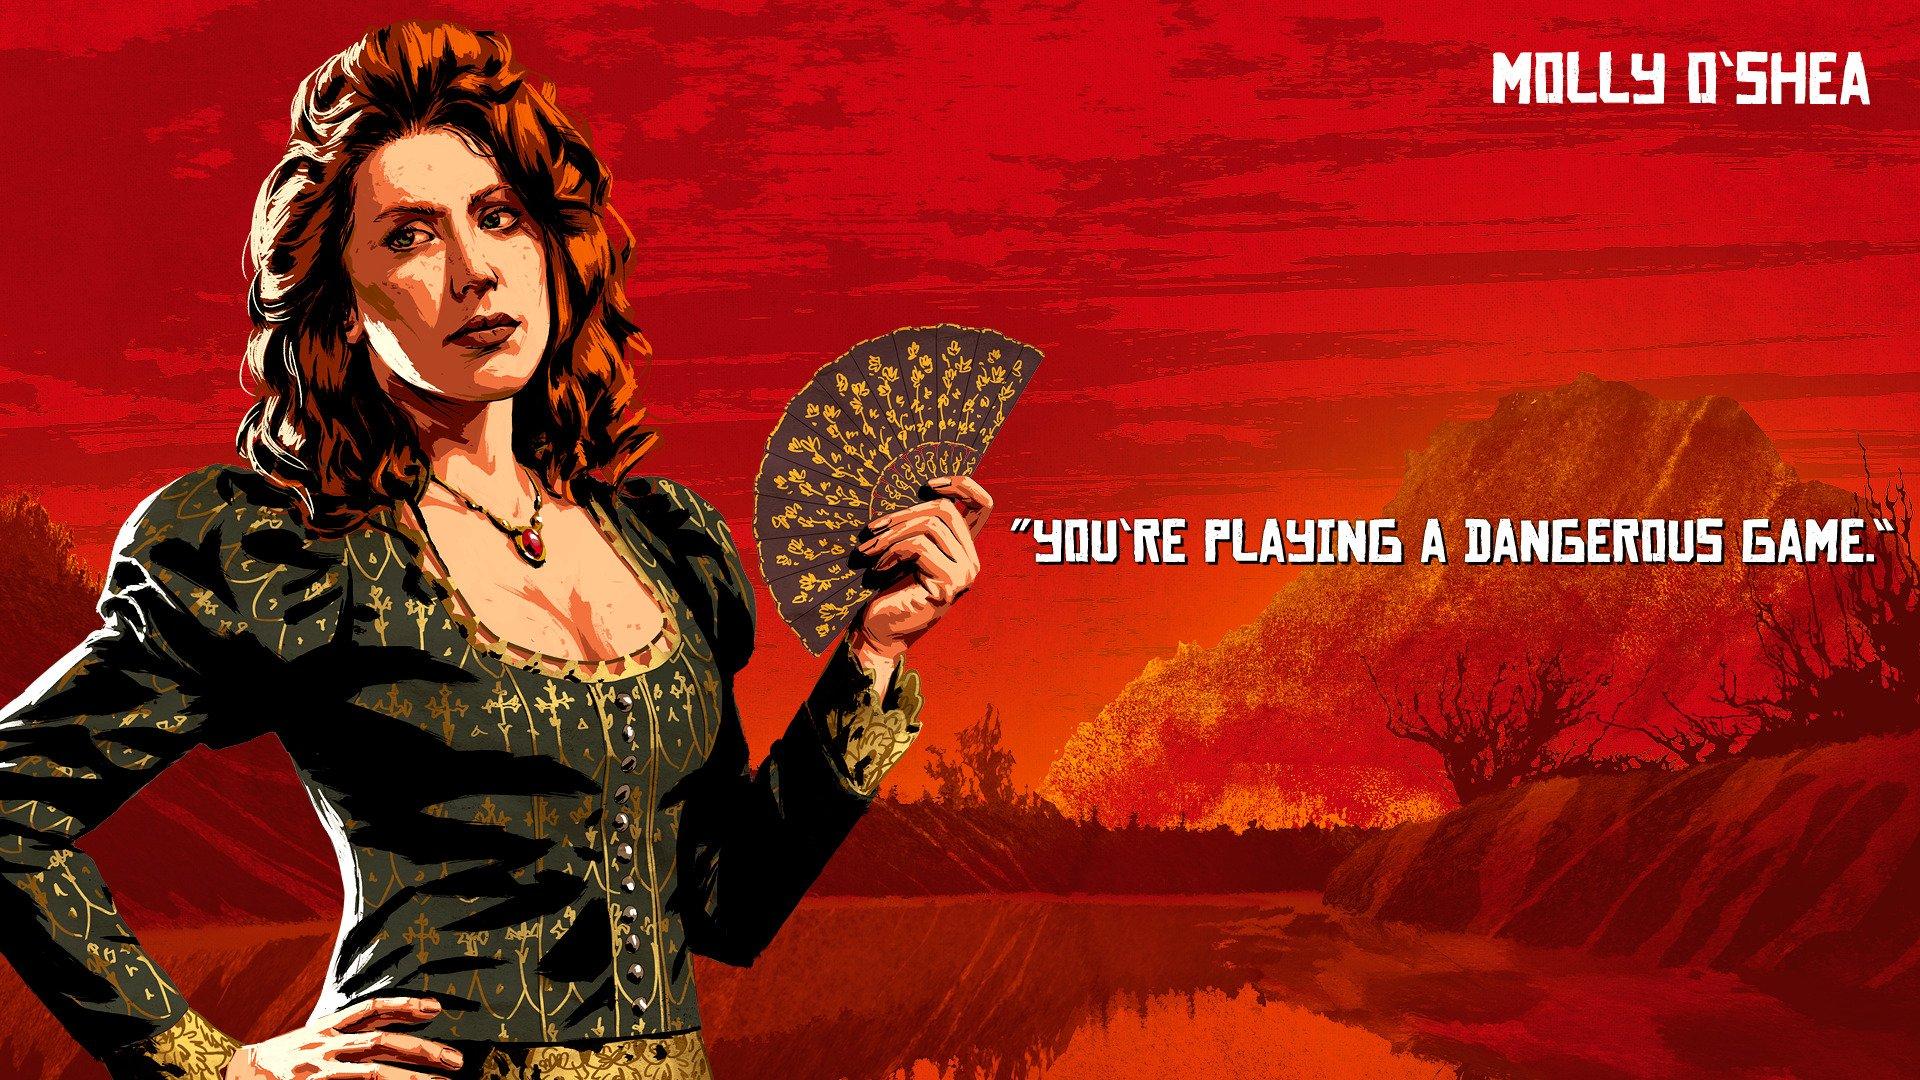 Rockstar Games revela artes dos personagens de Red Dead Redemption 2; veja 12